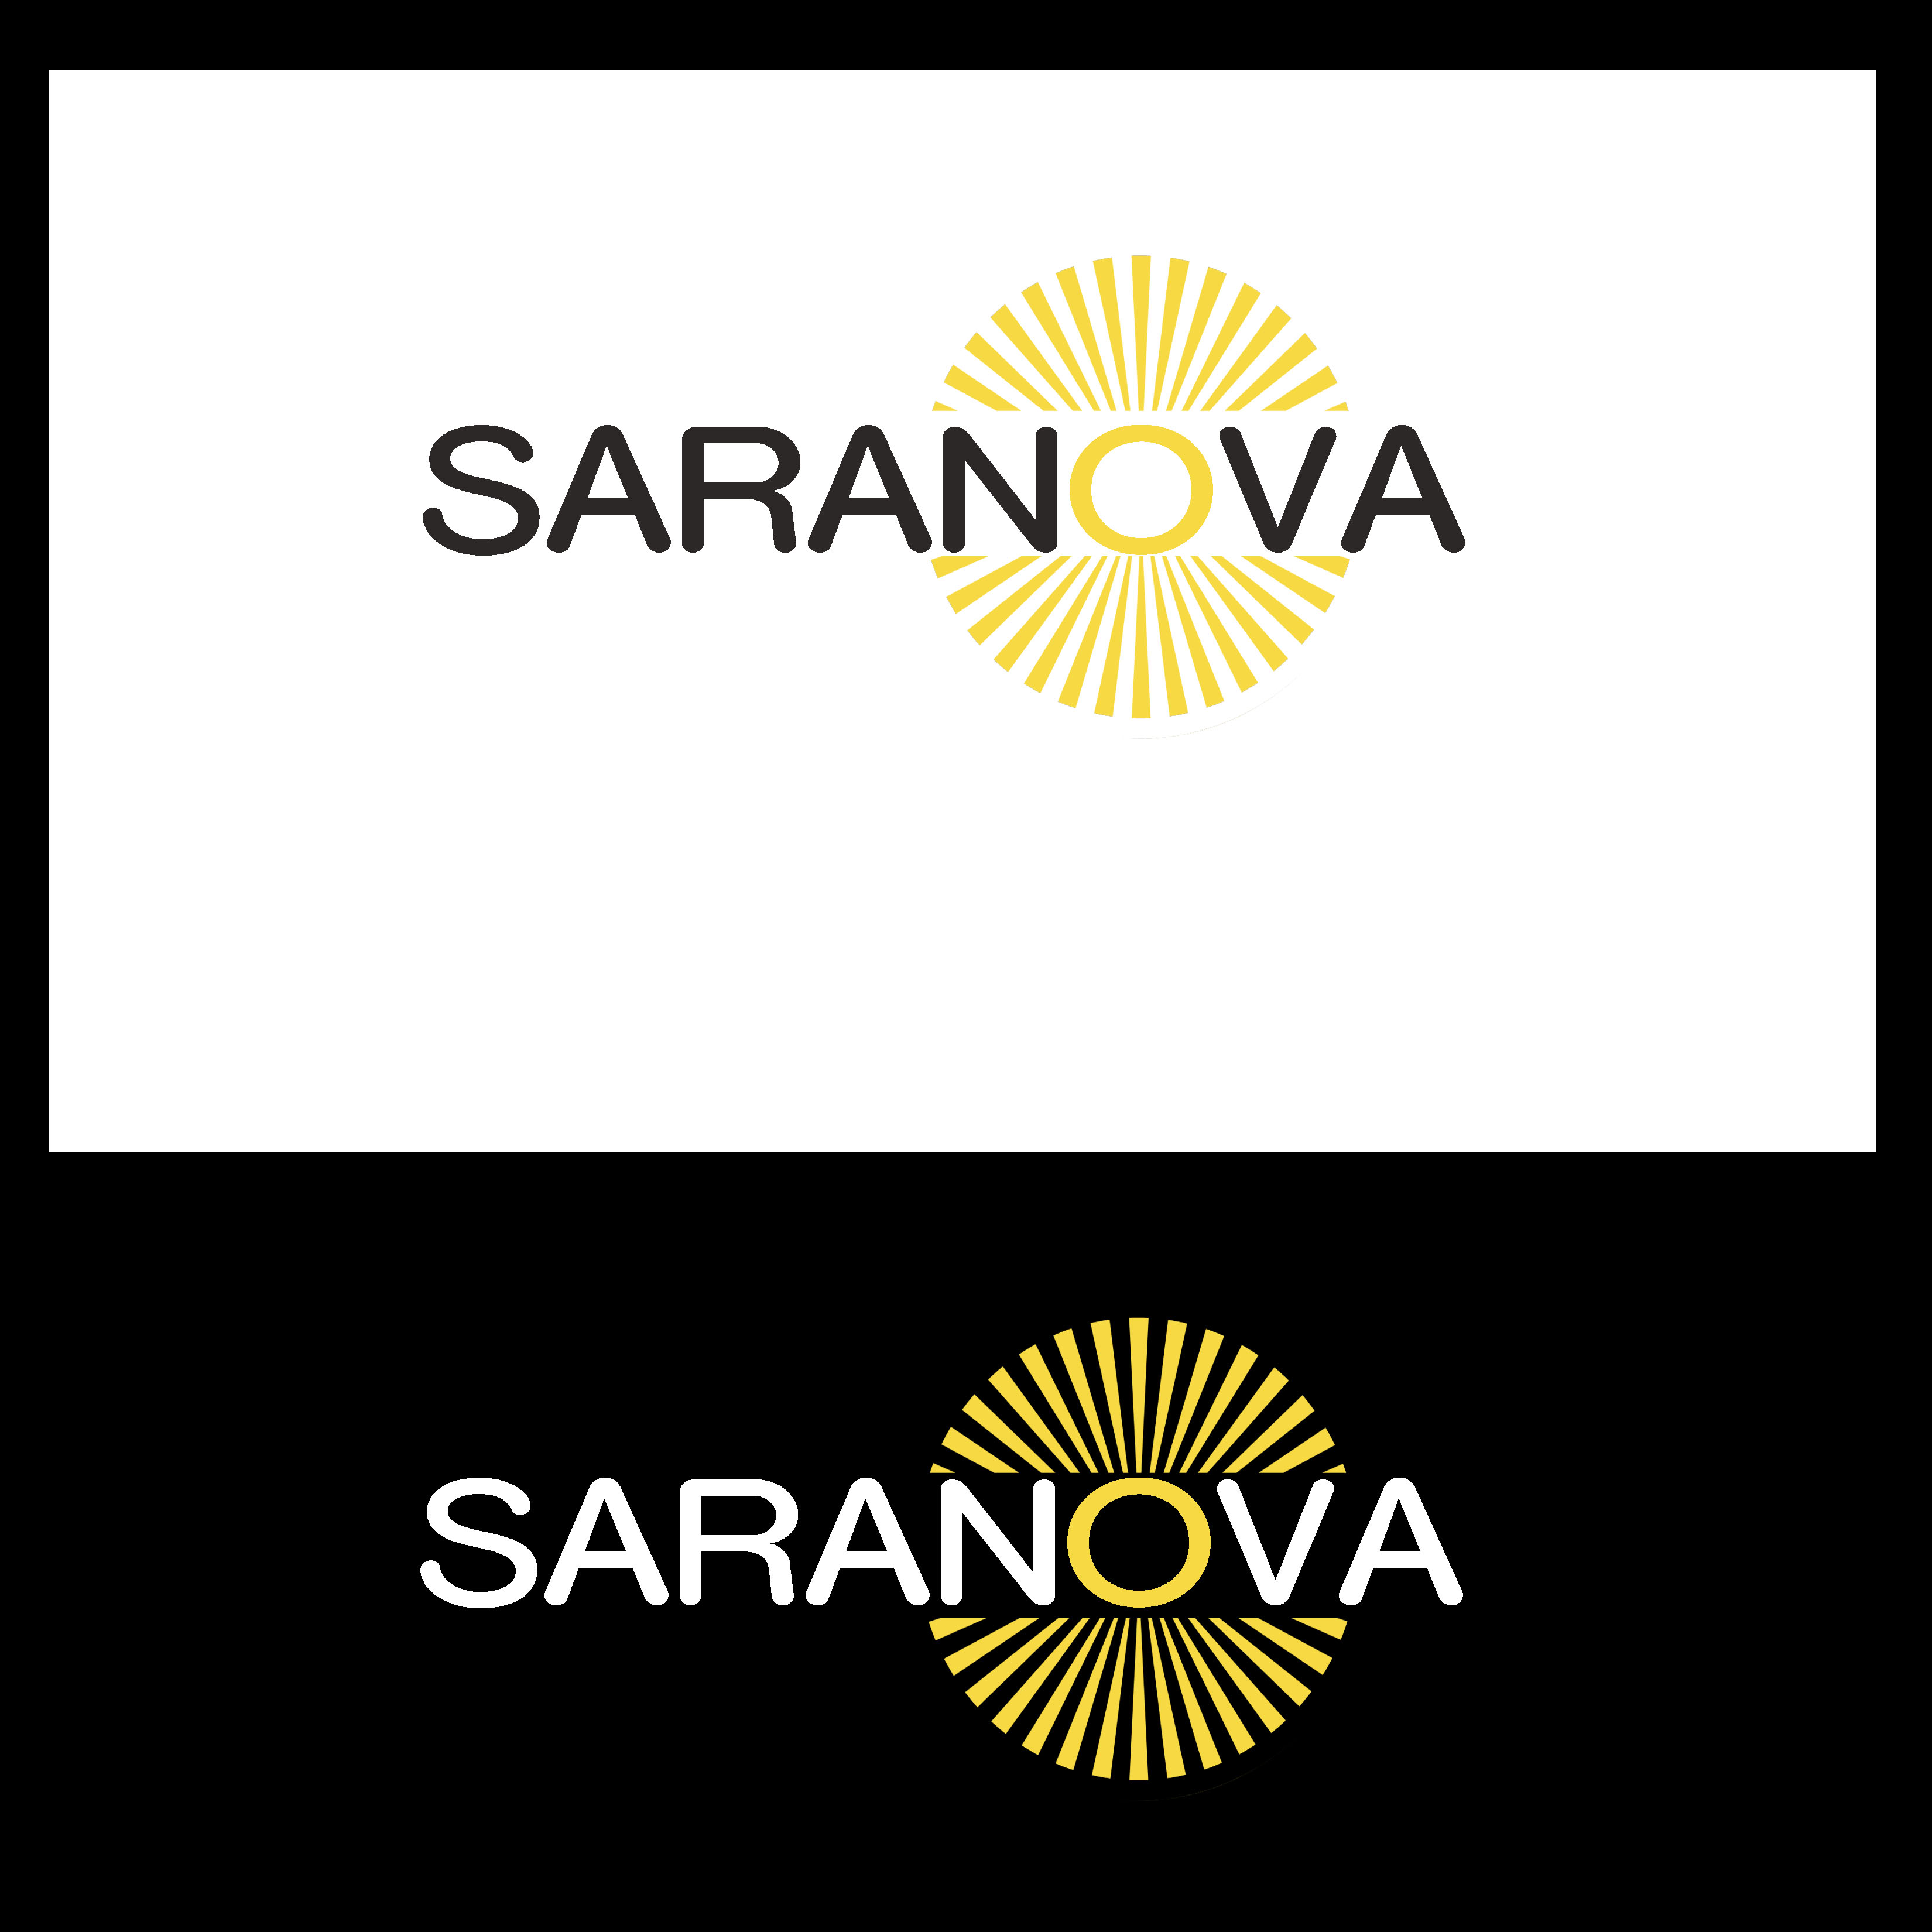 Logo Design by Allan Esclamado - Entry No. 29 in the Logo Design Contest Artistic Logo Design for Saranova.